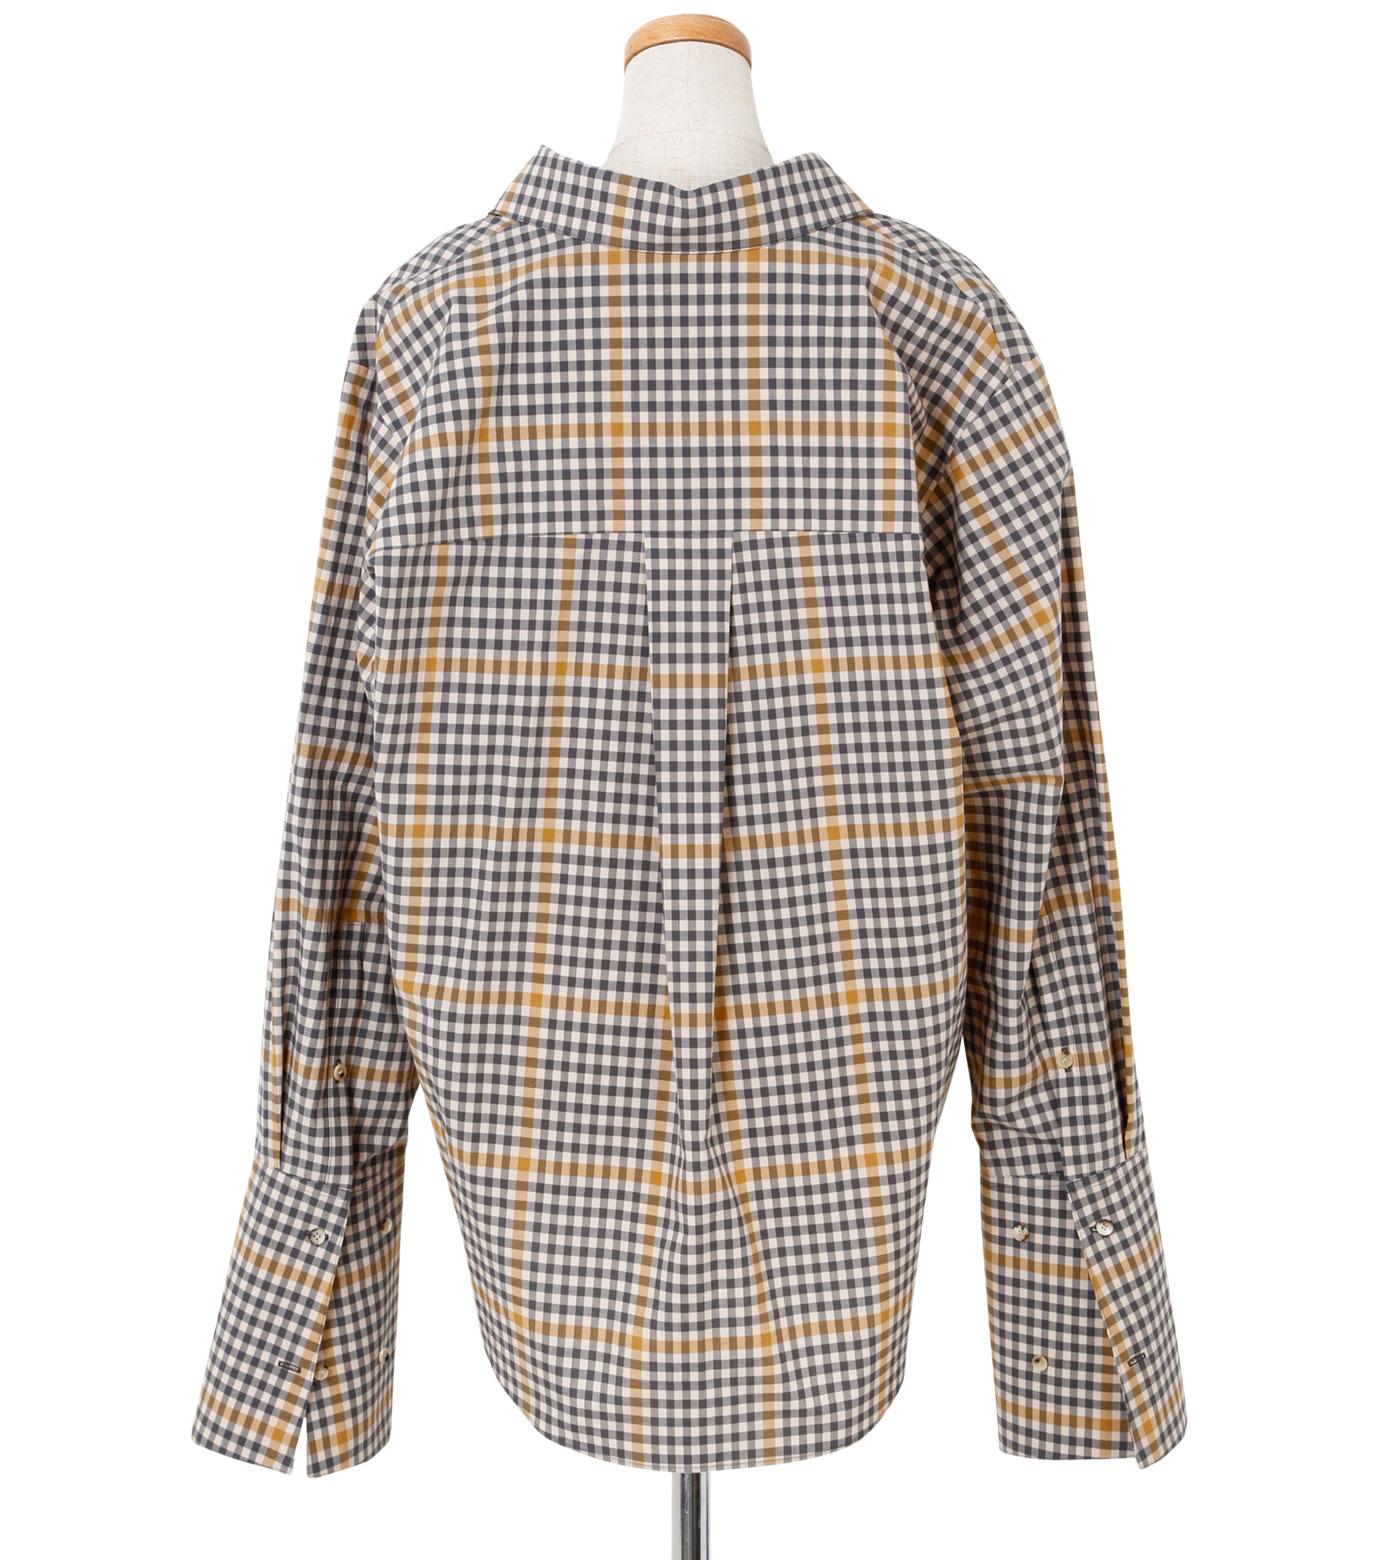 IRENE(アイレネ)のグラフチェックシャツ-LIGHT BEIGE(シャツ/shirt)-19S83001 拡大詳細画像3